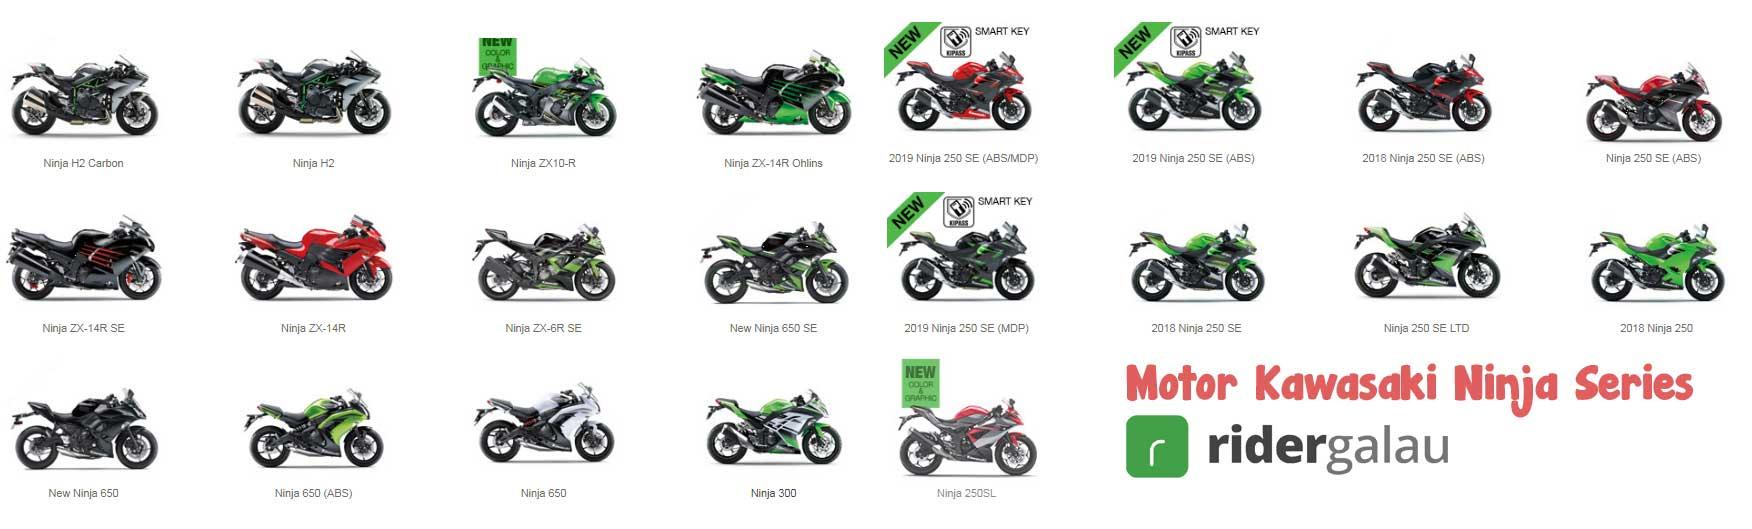 45 Daftar Harga Produk Motor Kawasaki Ninja Z Kx Klx Dan Versys Terbaru 2021